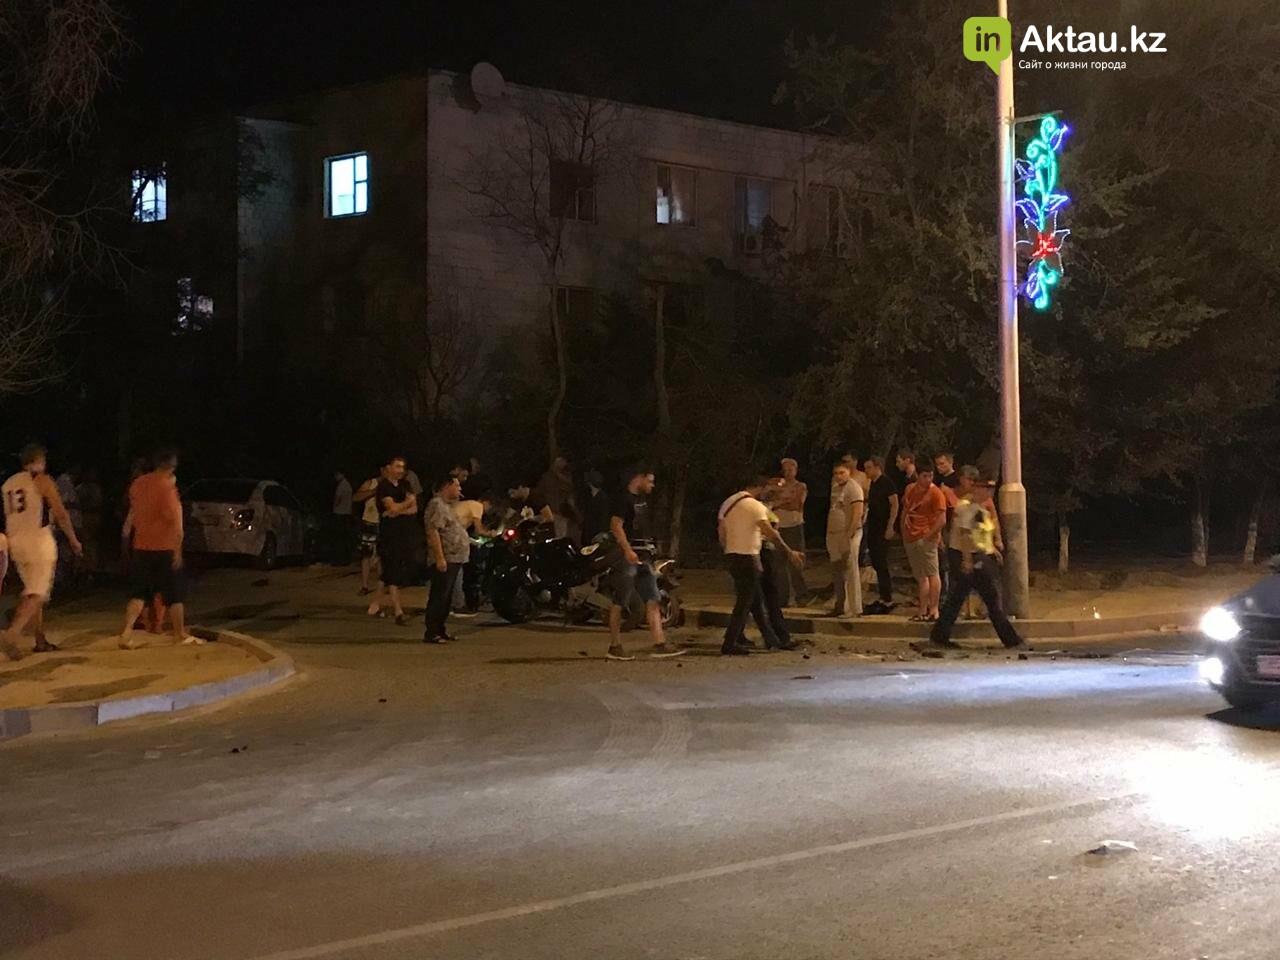 Мотоциклист пострадал в аварии в Актау (ВИДЕО), фото-5